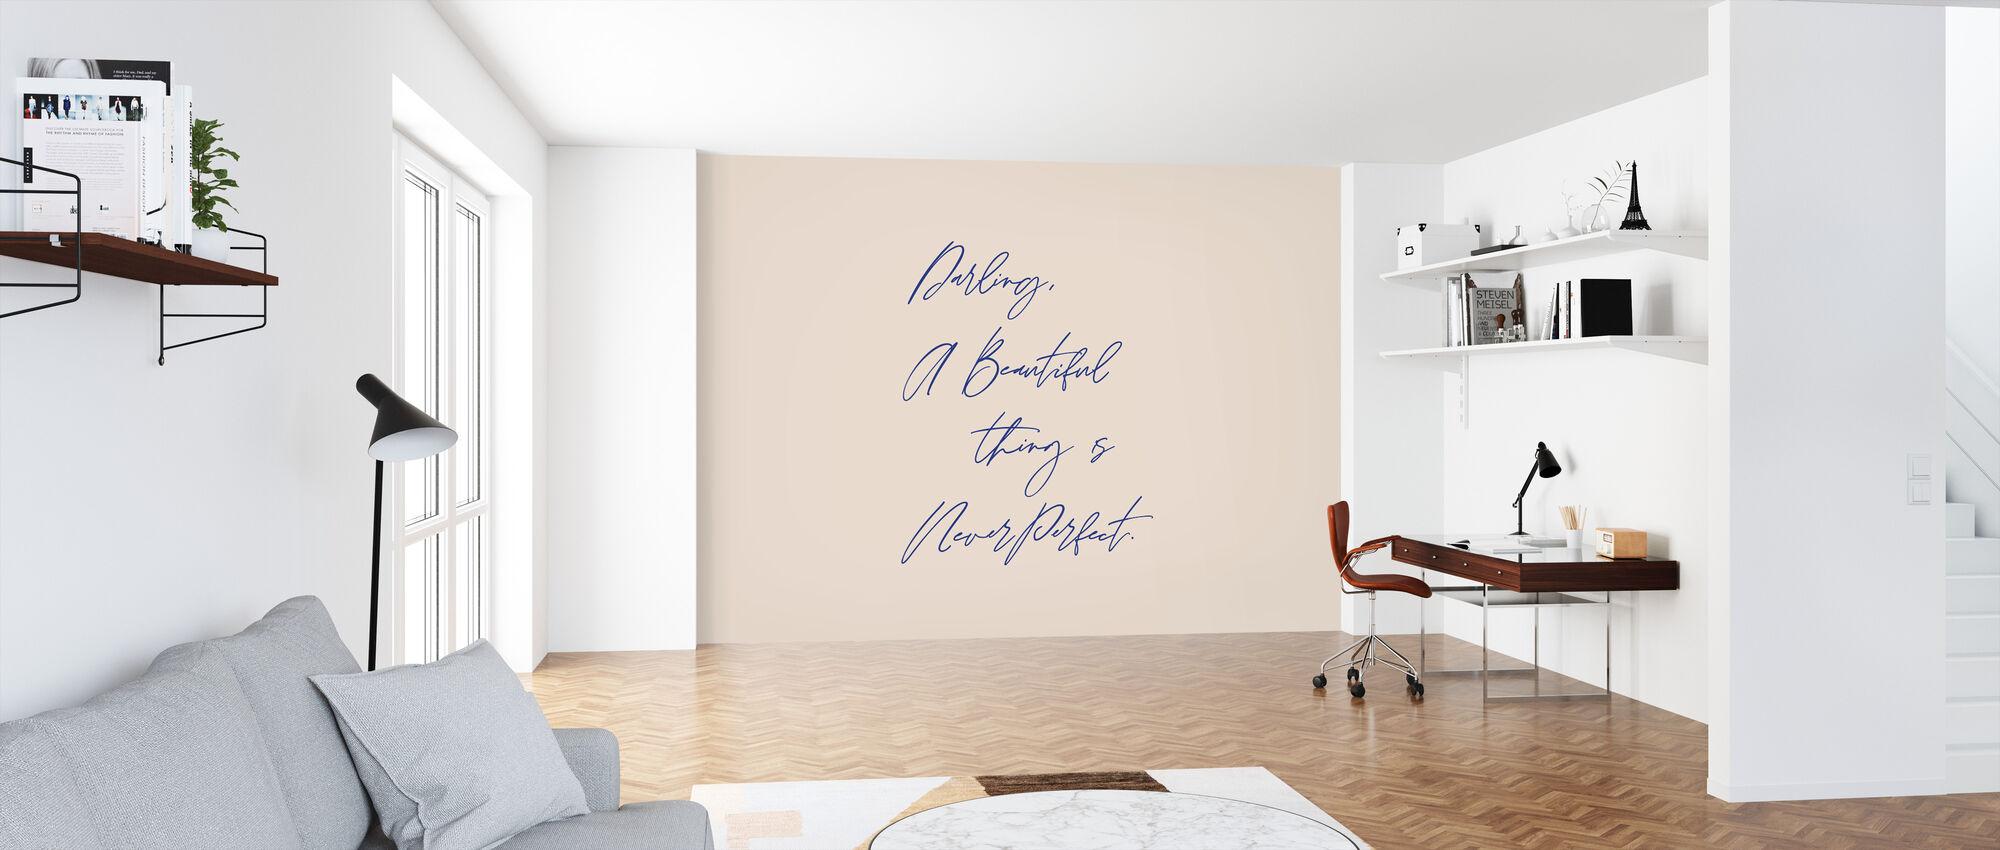 Beautiful Thing - Wallpaper - Office